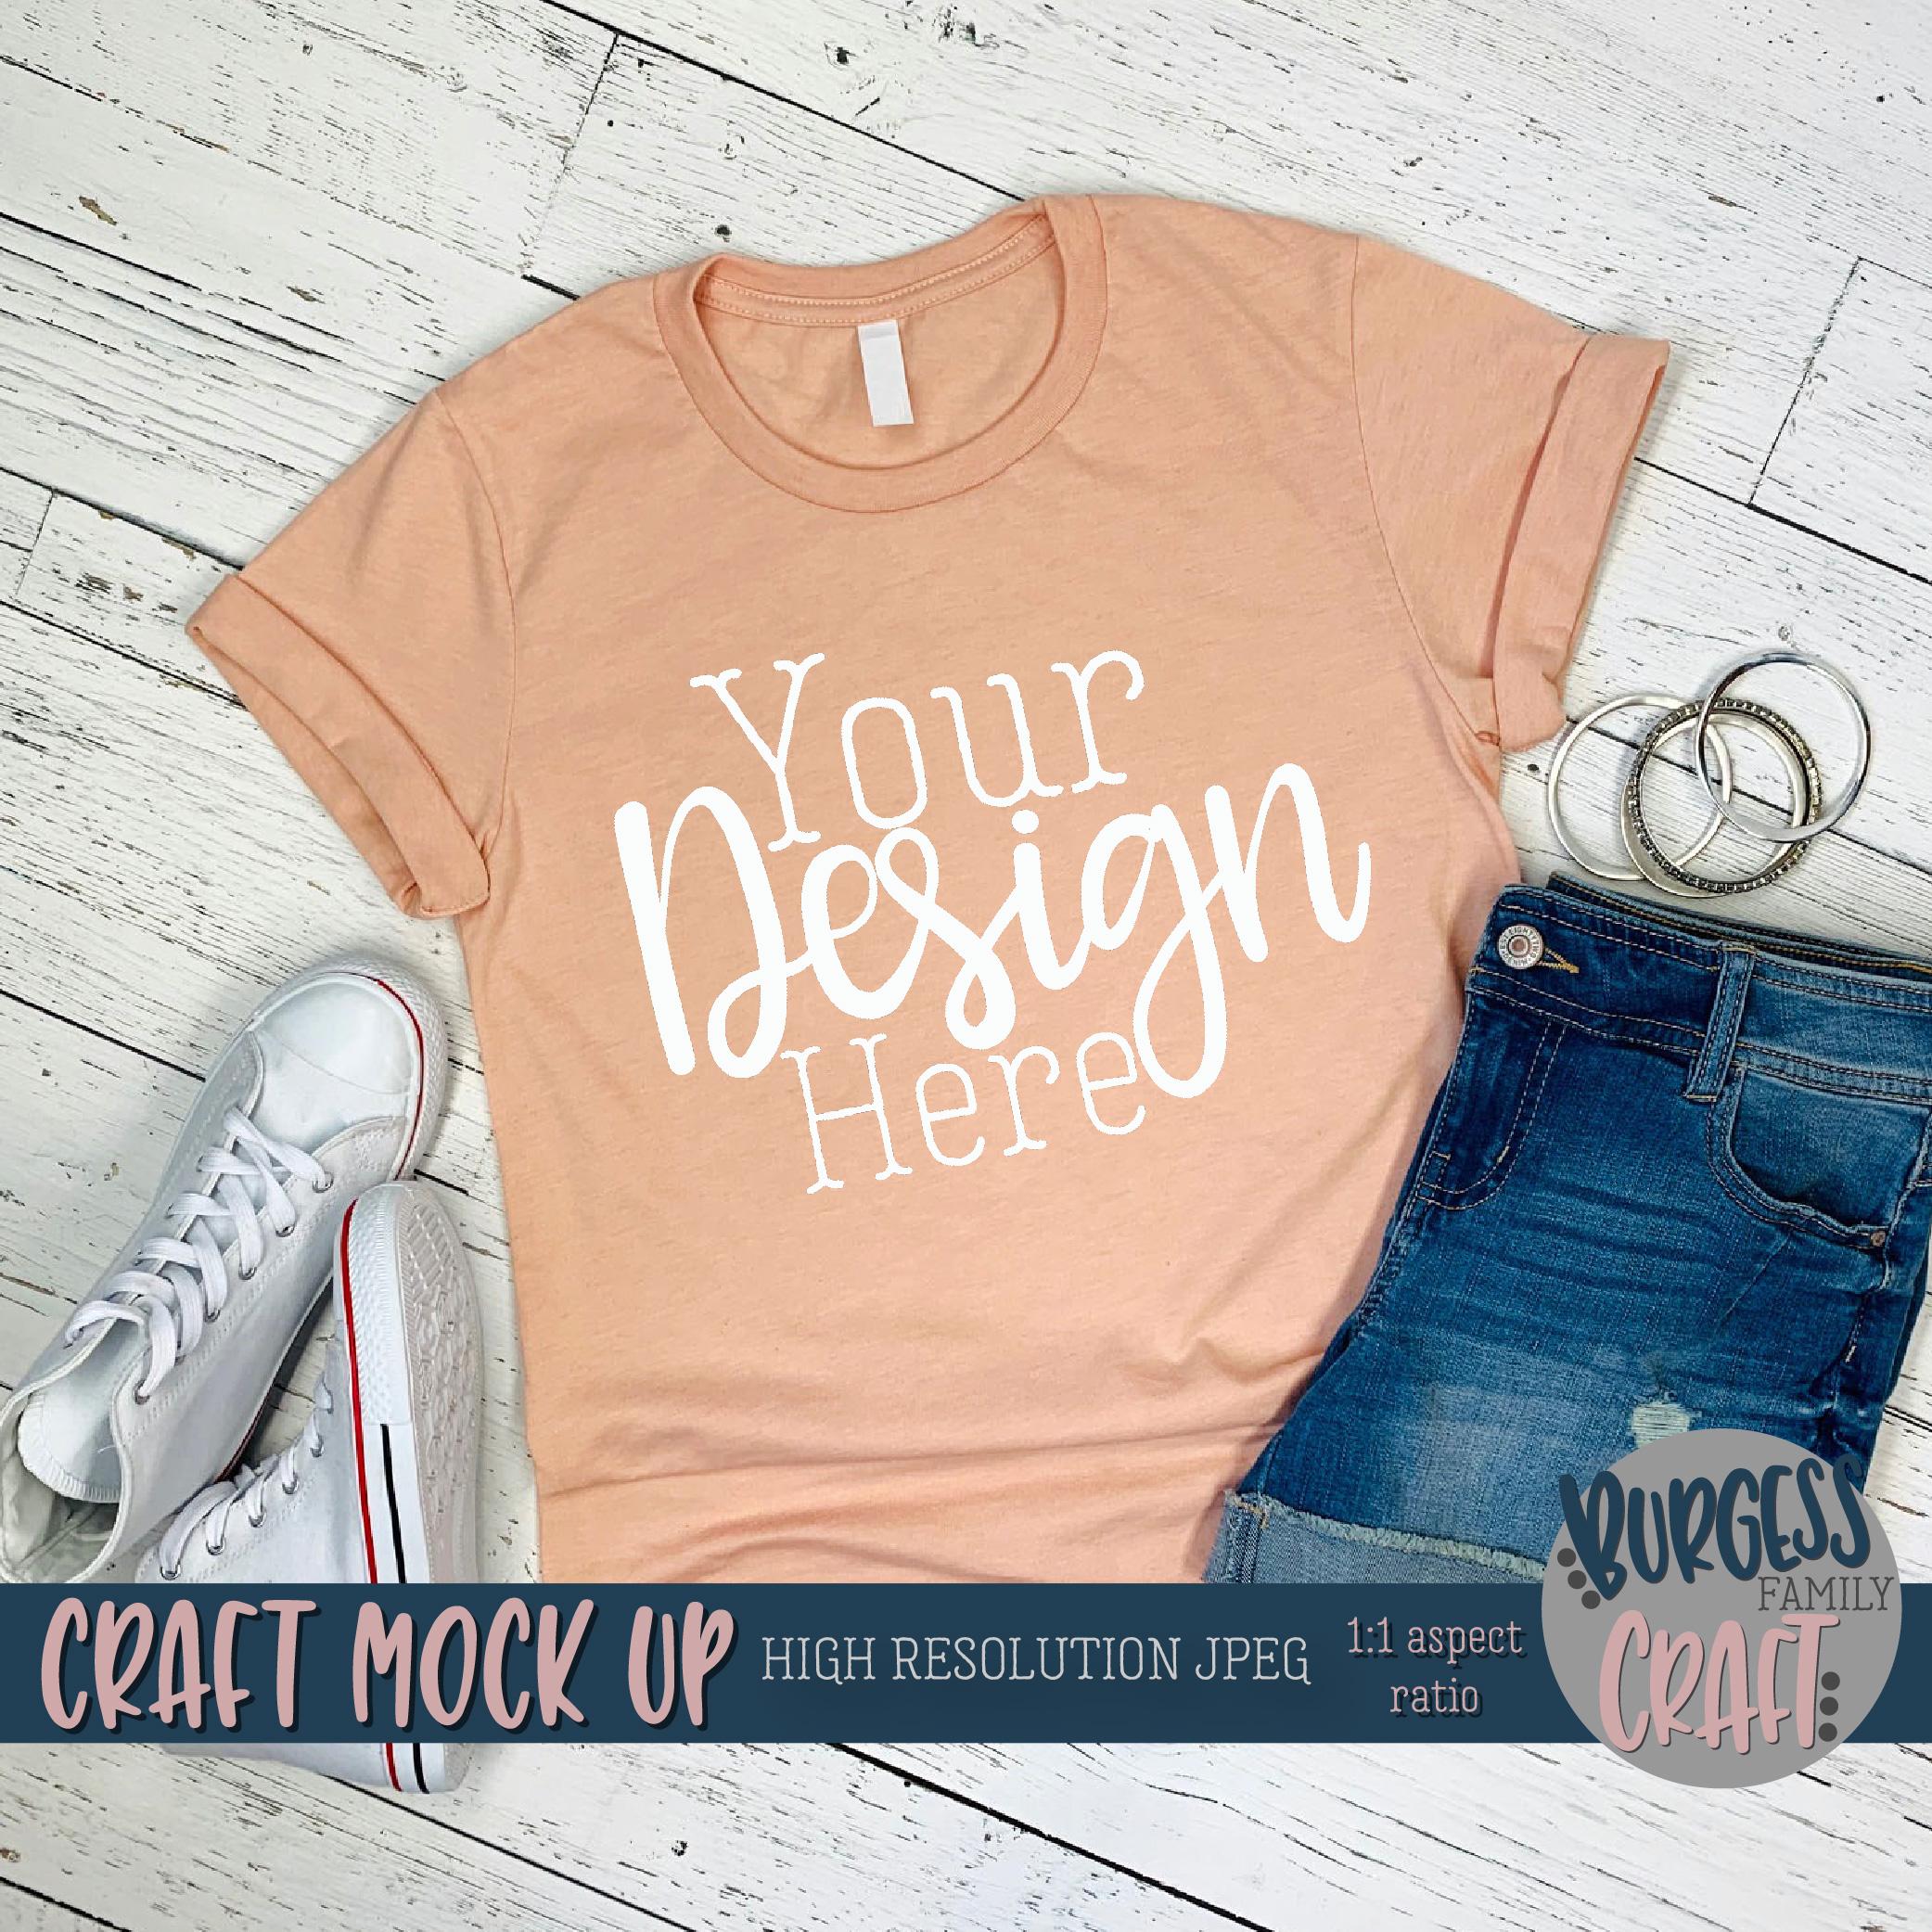 Summer peach shirt Pt 2 3001 Craft mock up | High Res JPEG example image 2